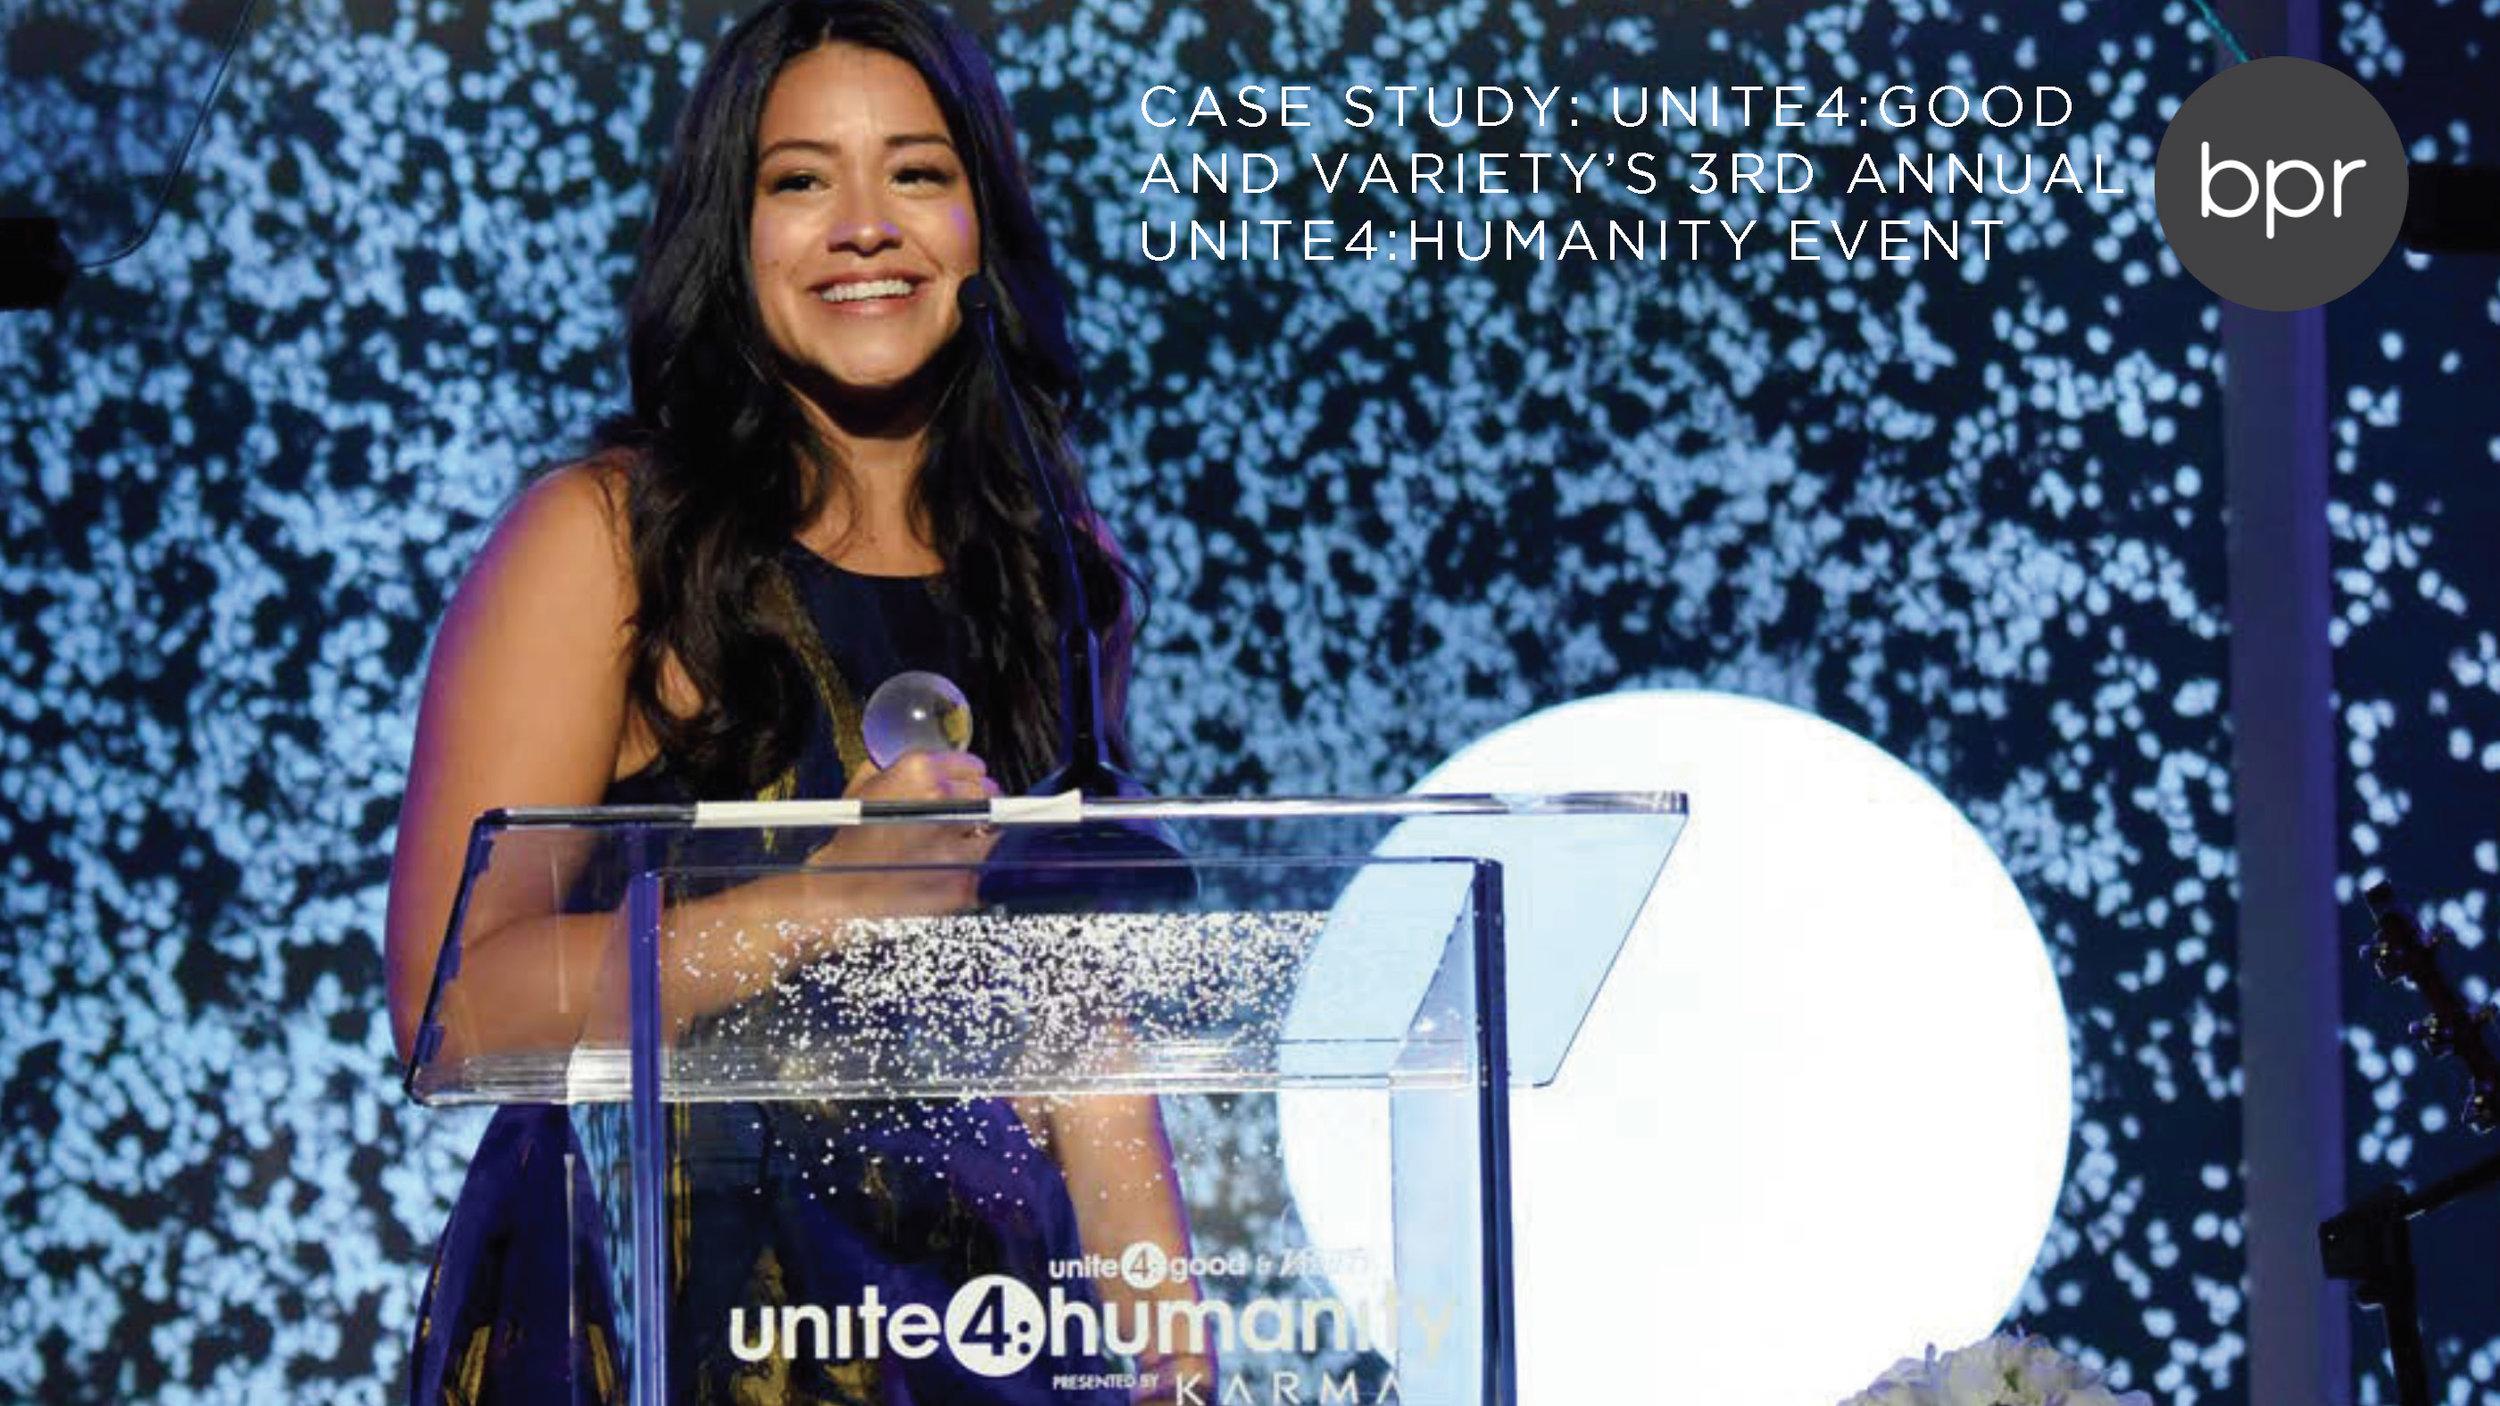 Unite4Humanity Case Study_Page_1.jpg